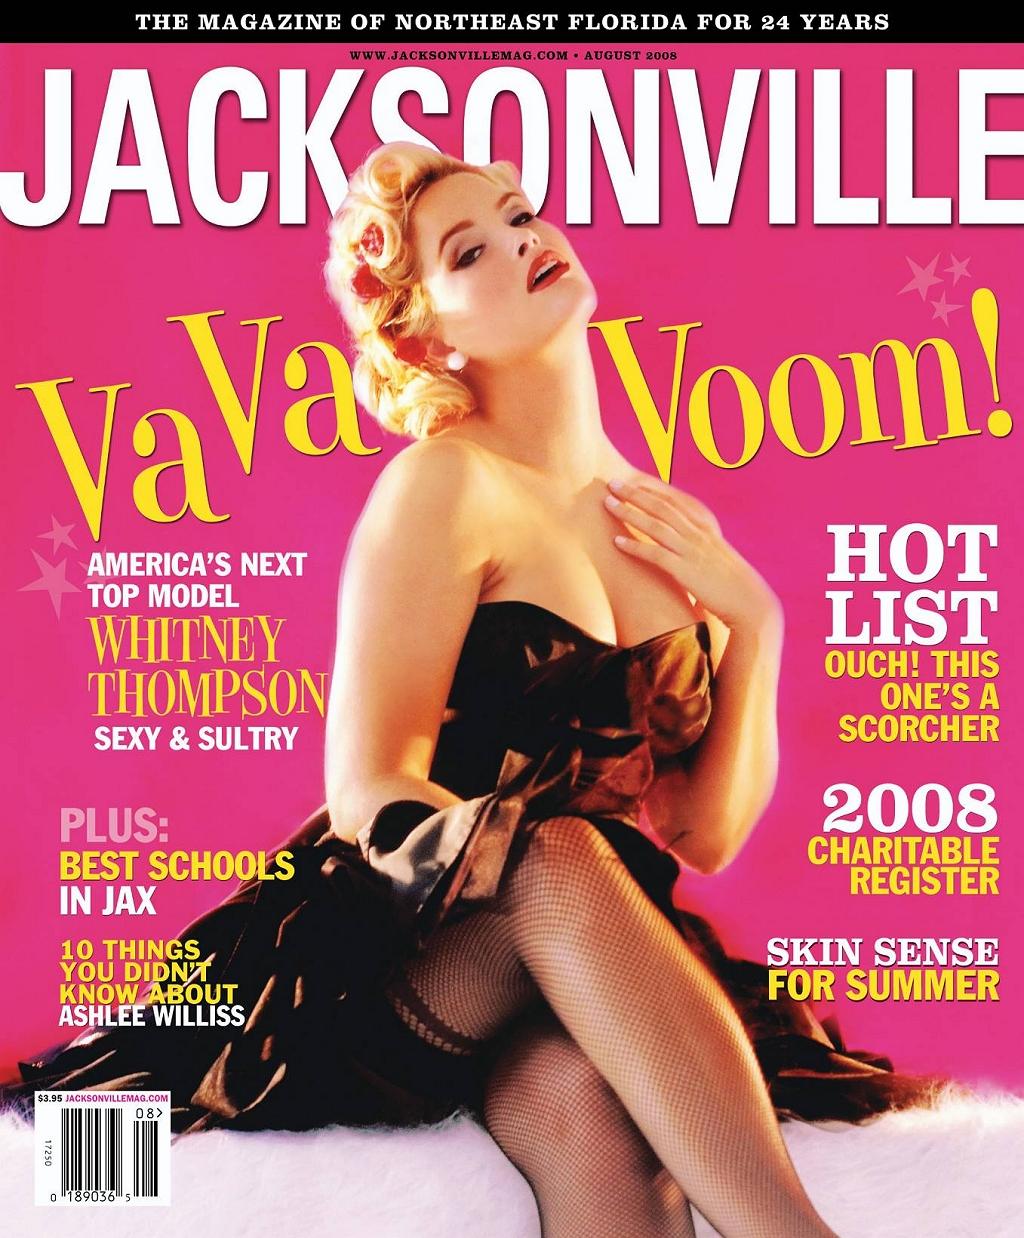 Whitney Thompson: America's Next Top Model August 2008 Issue Jacksonville Magazine Jacksonville Magazine